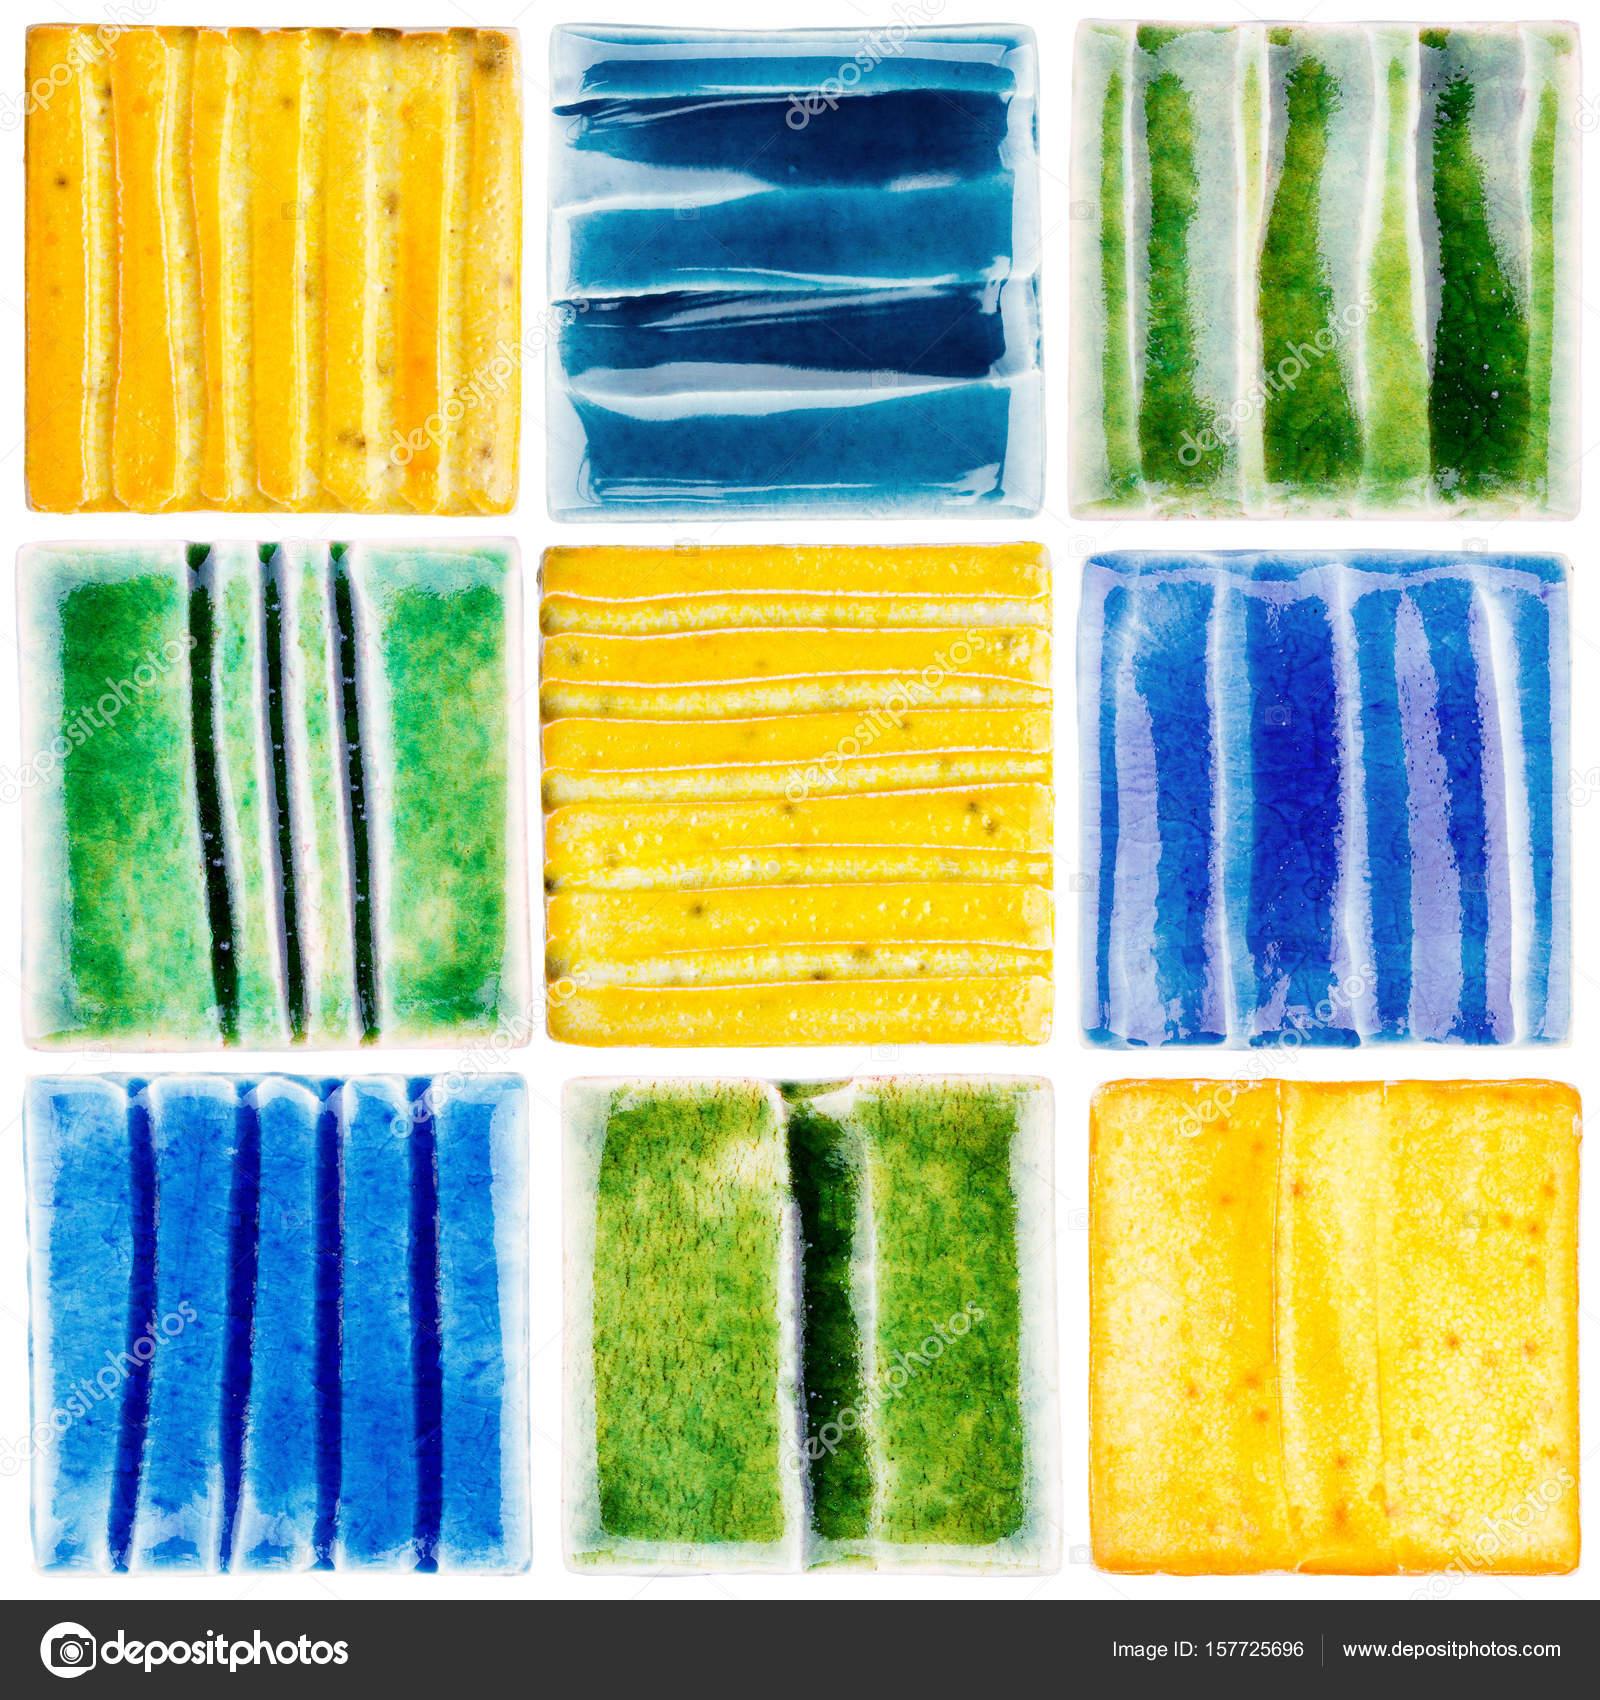 Collection of handmade glazed ceramic tiles stock photo taigi collection of handmade glazed ceramic tiles stock photo dailygadgetfo Choice Image